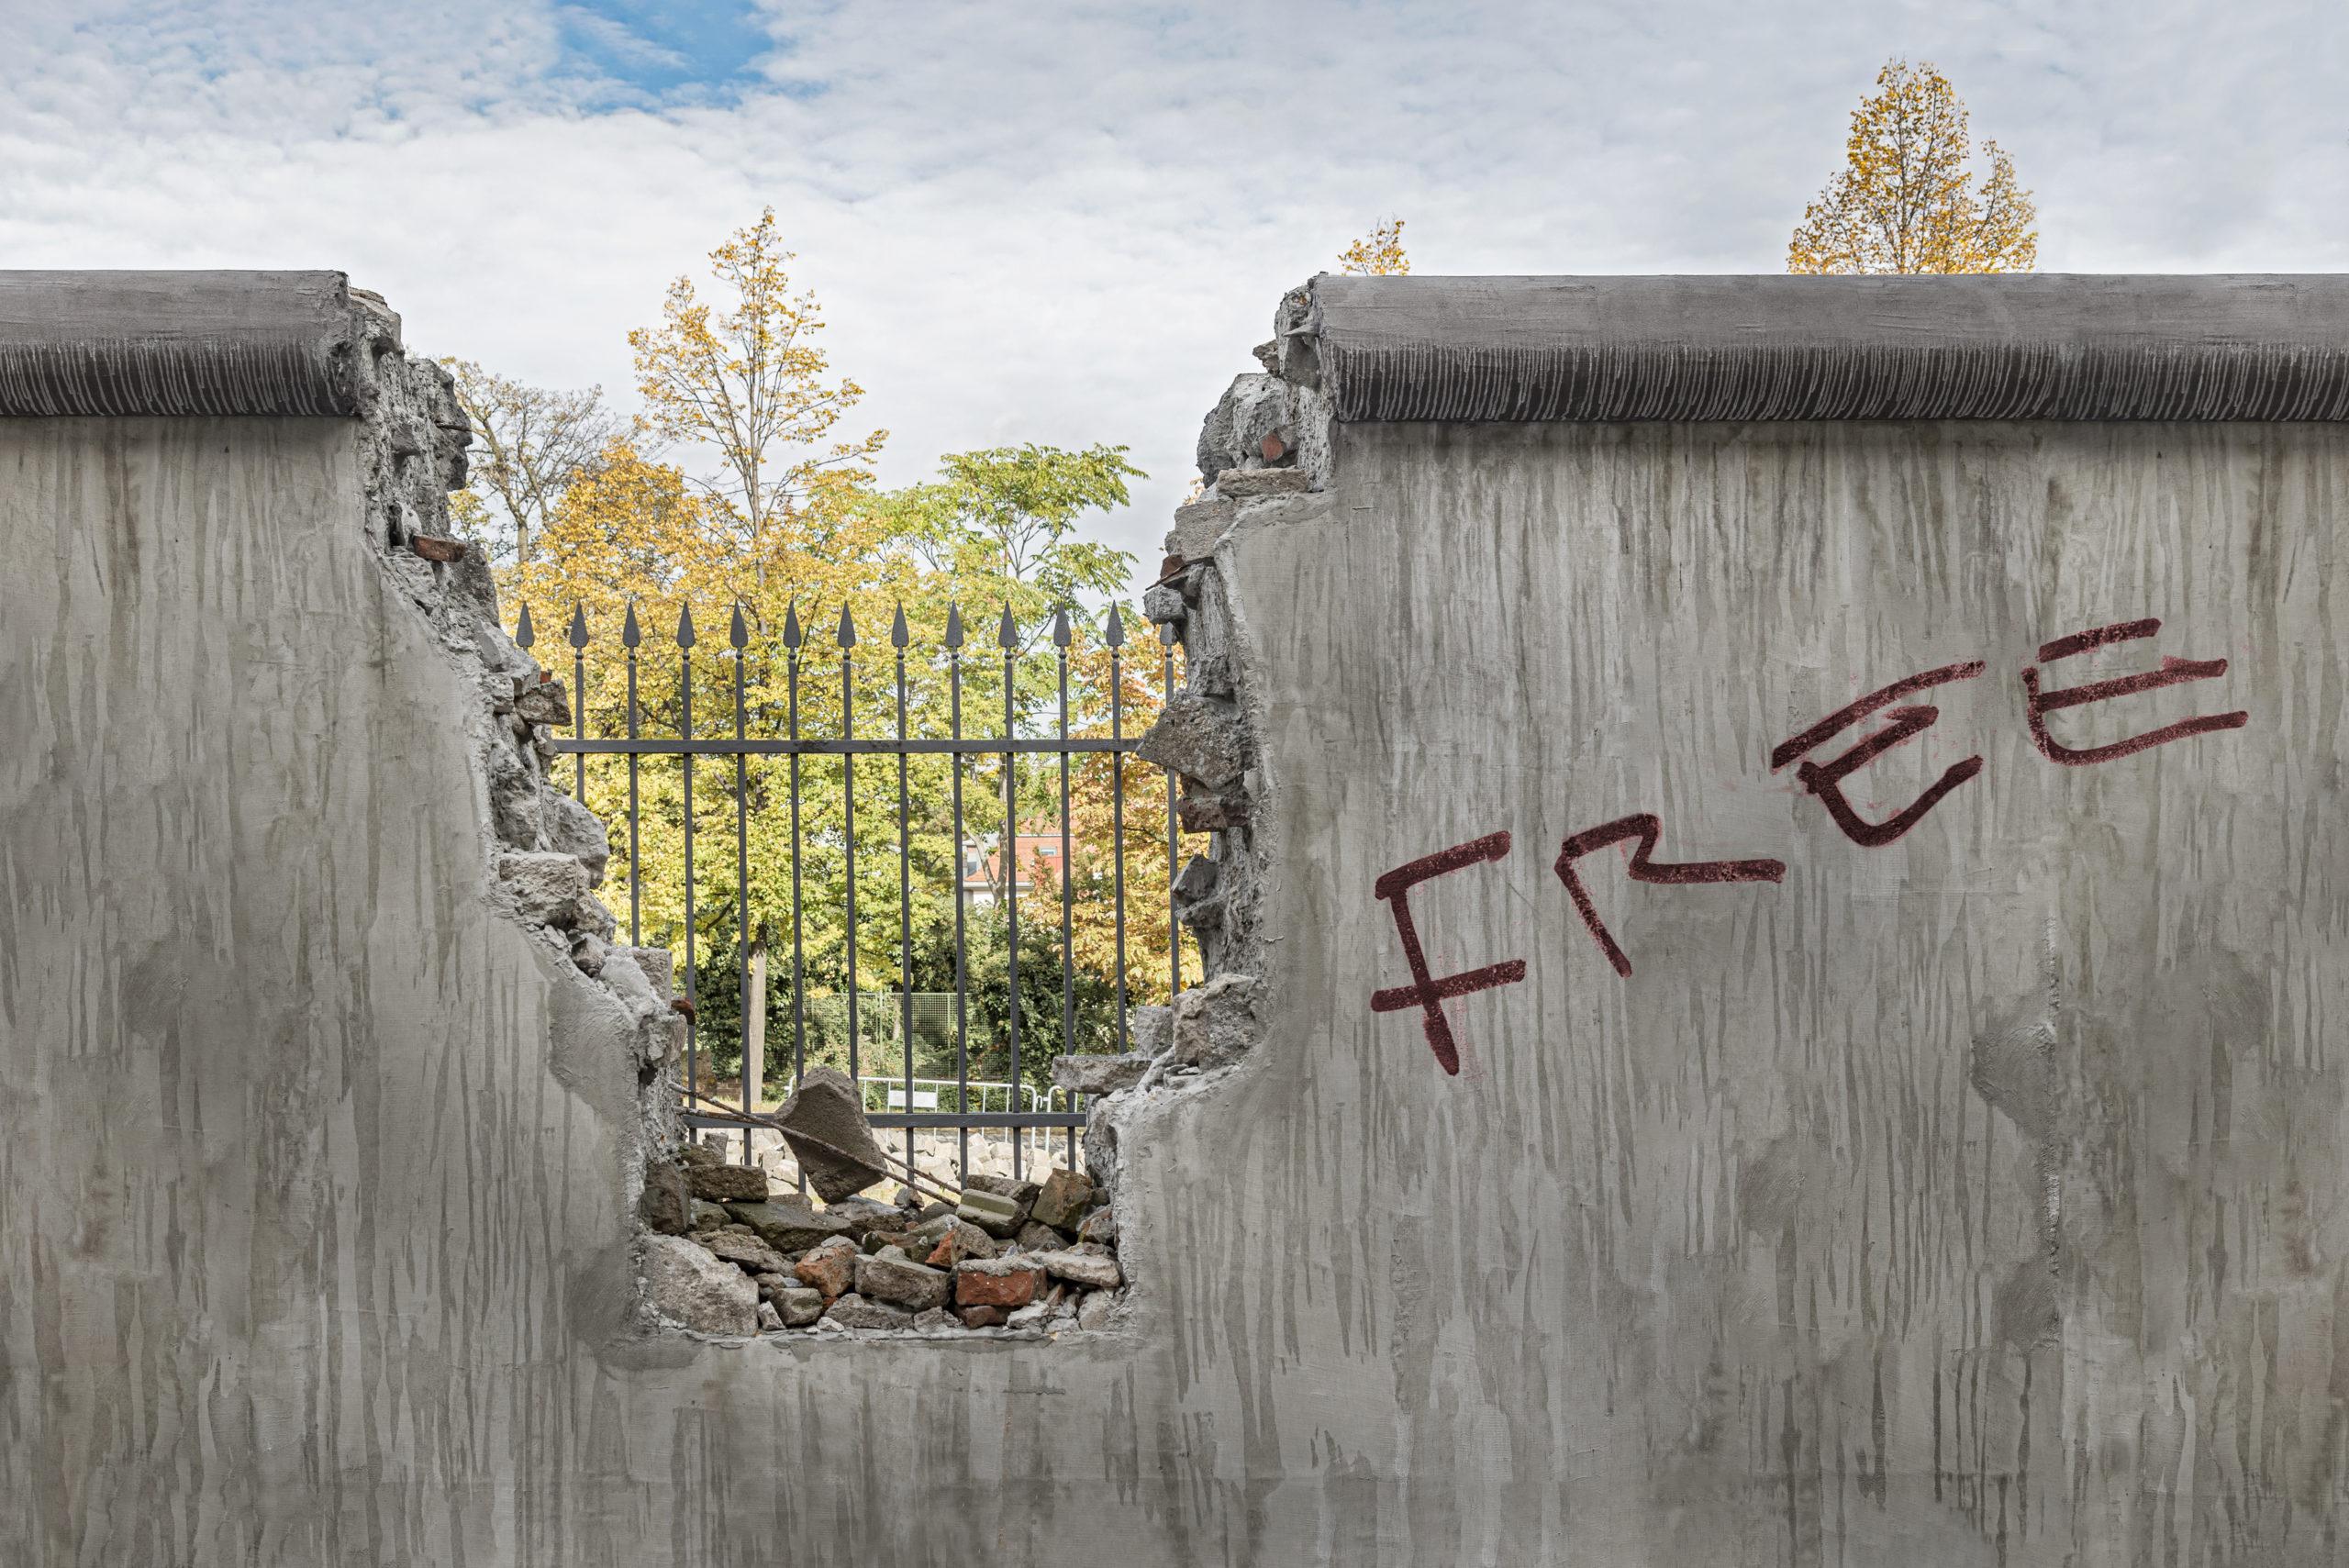 barricade berlin wall east west divide european union